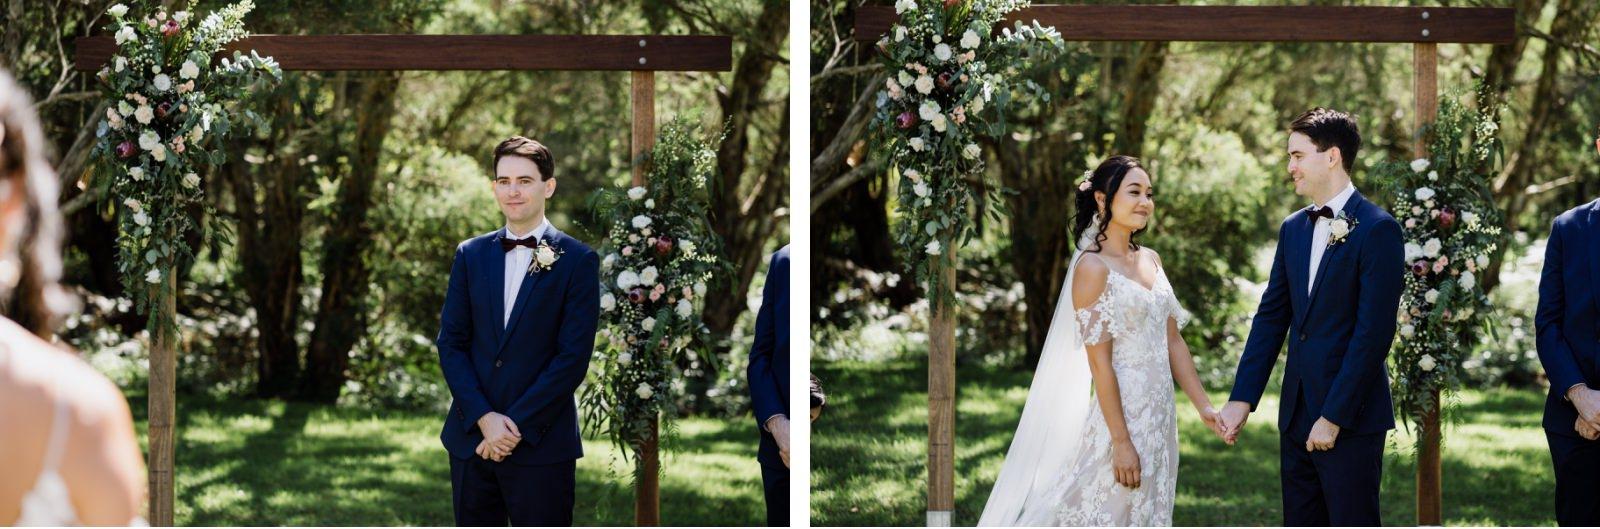 wollombi-wedding-photography-hunter-valley-wedding-photographers-28